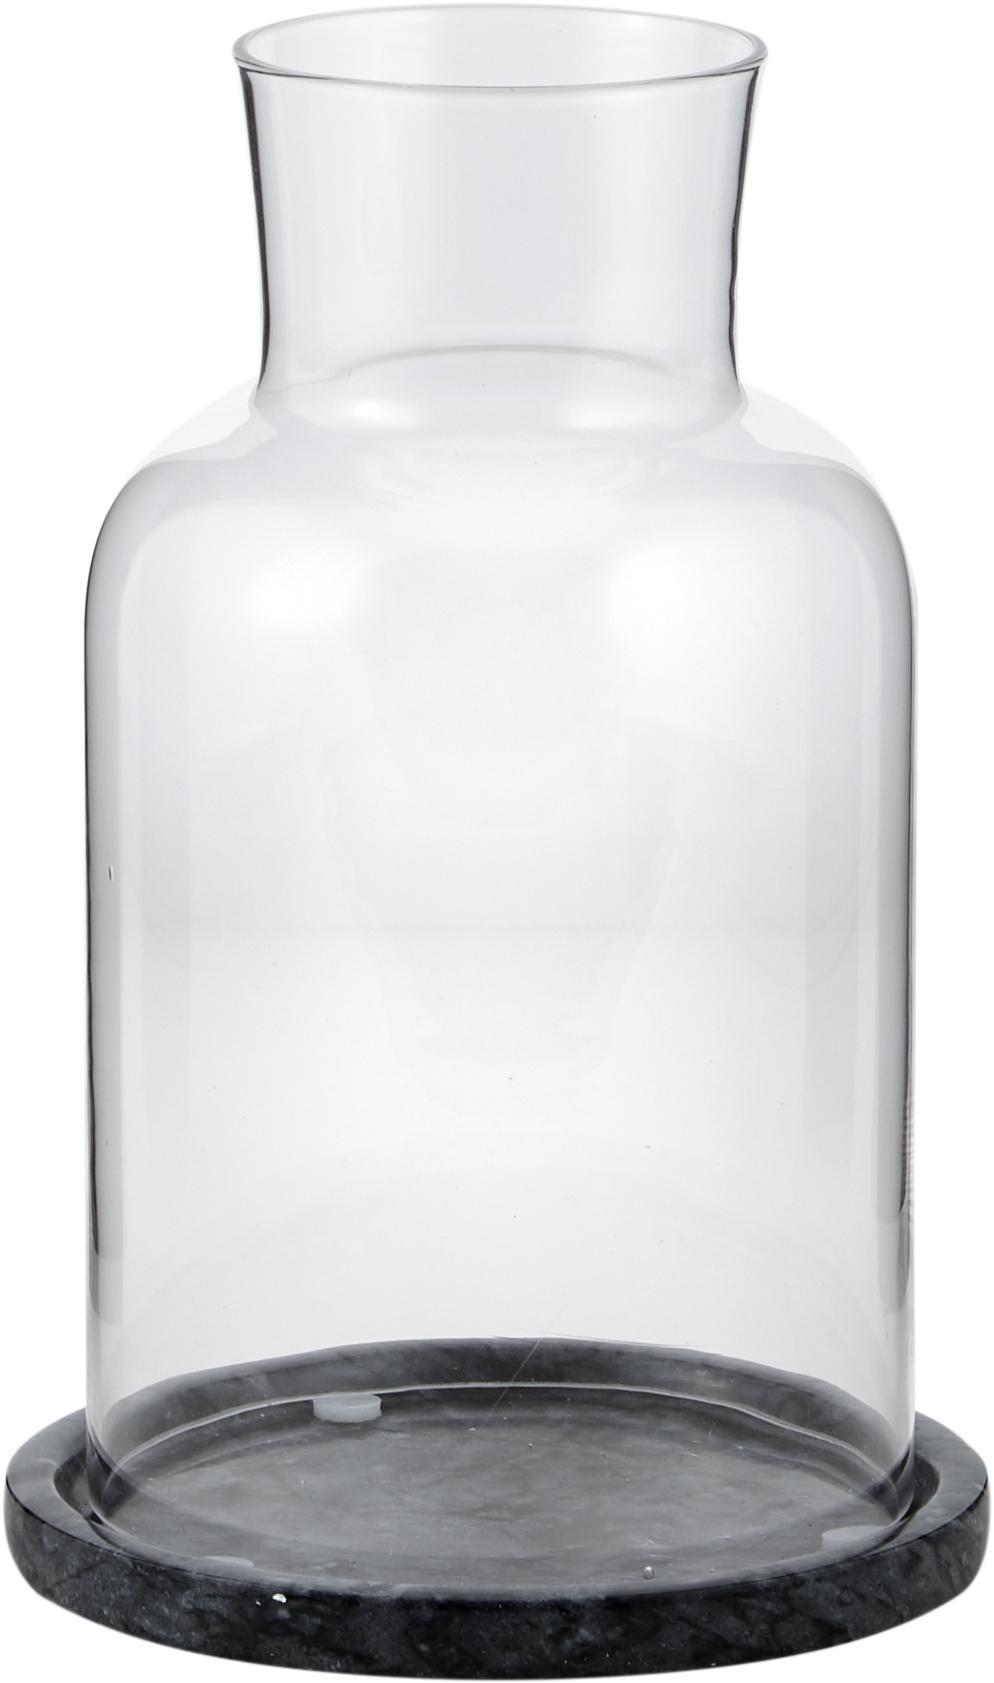 Portavela de mármol Lindon, Vidrio, mármol, Mármol negro, transparente, Ø 13x Al 22 cm